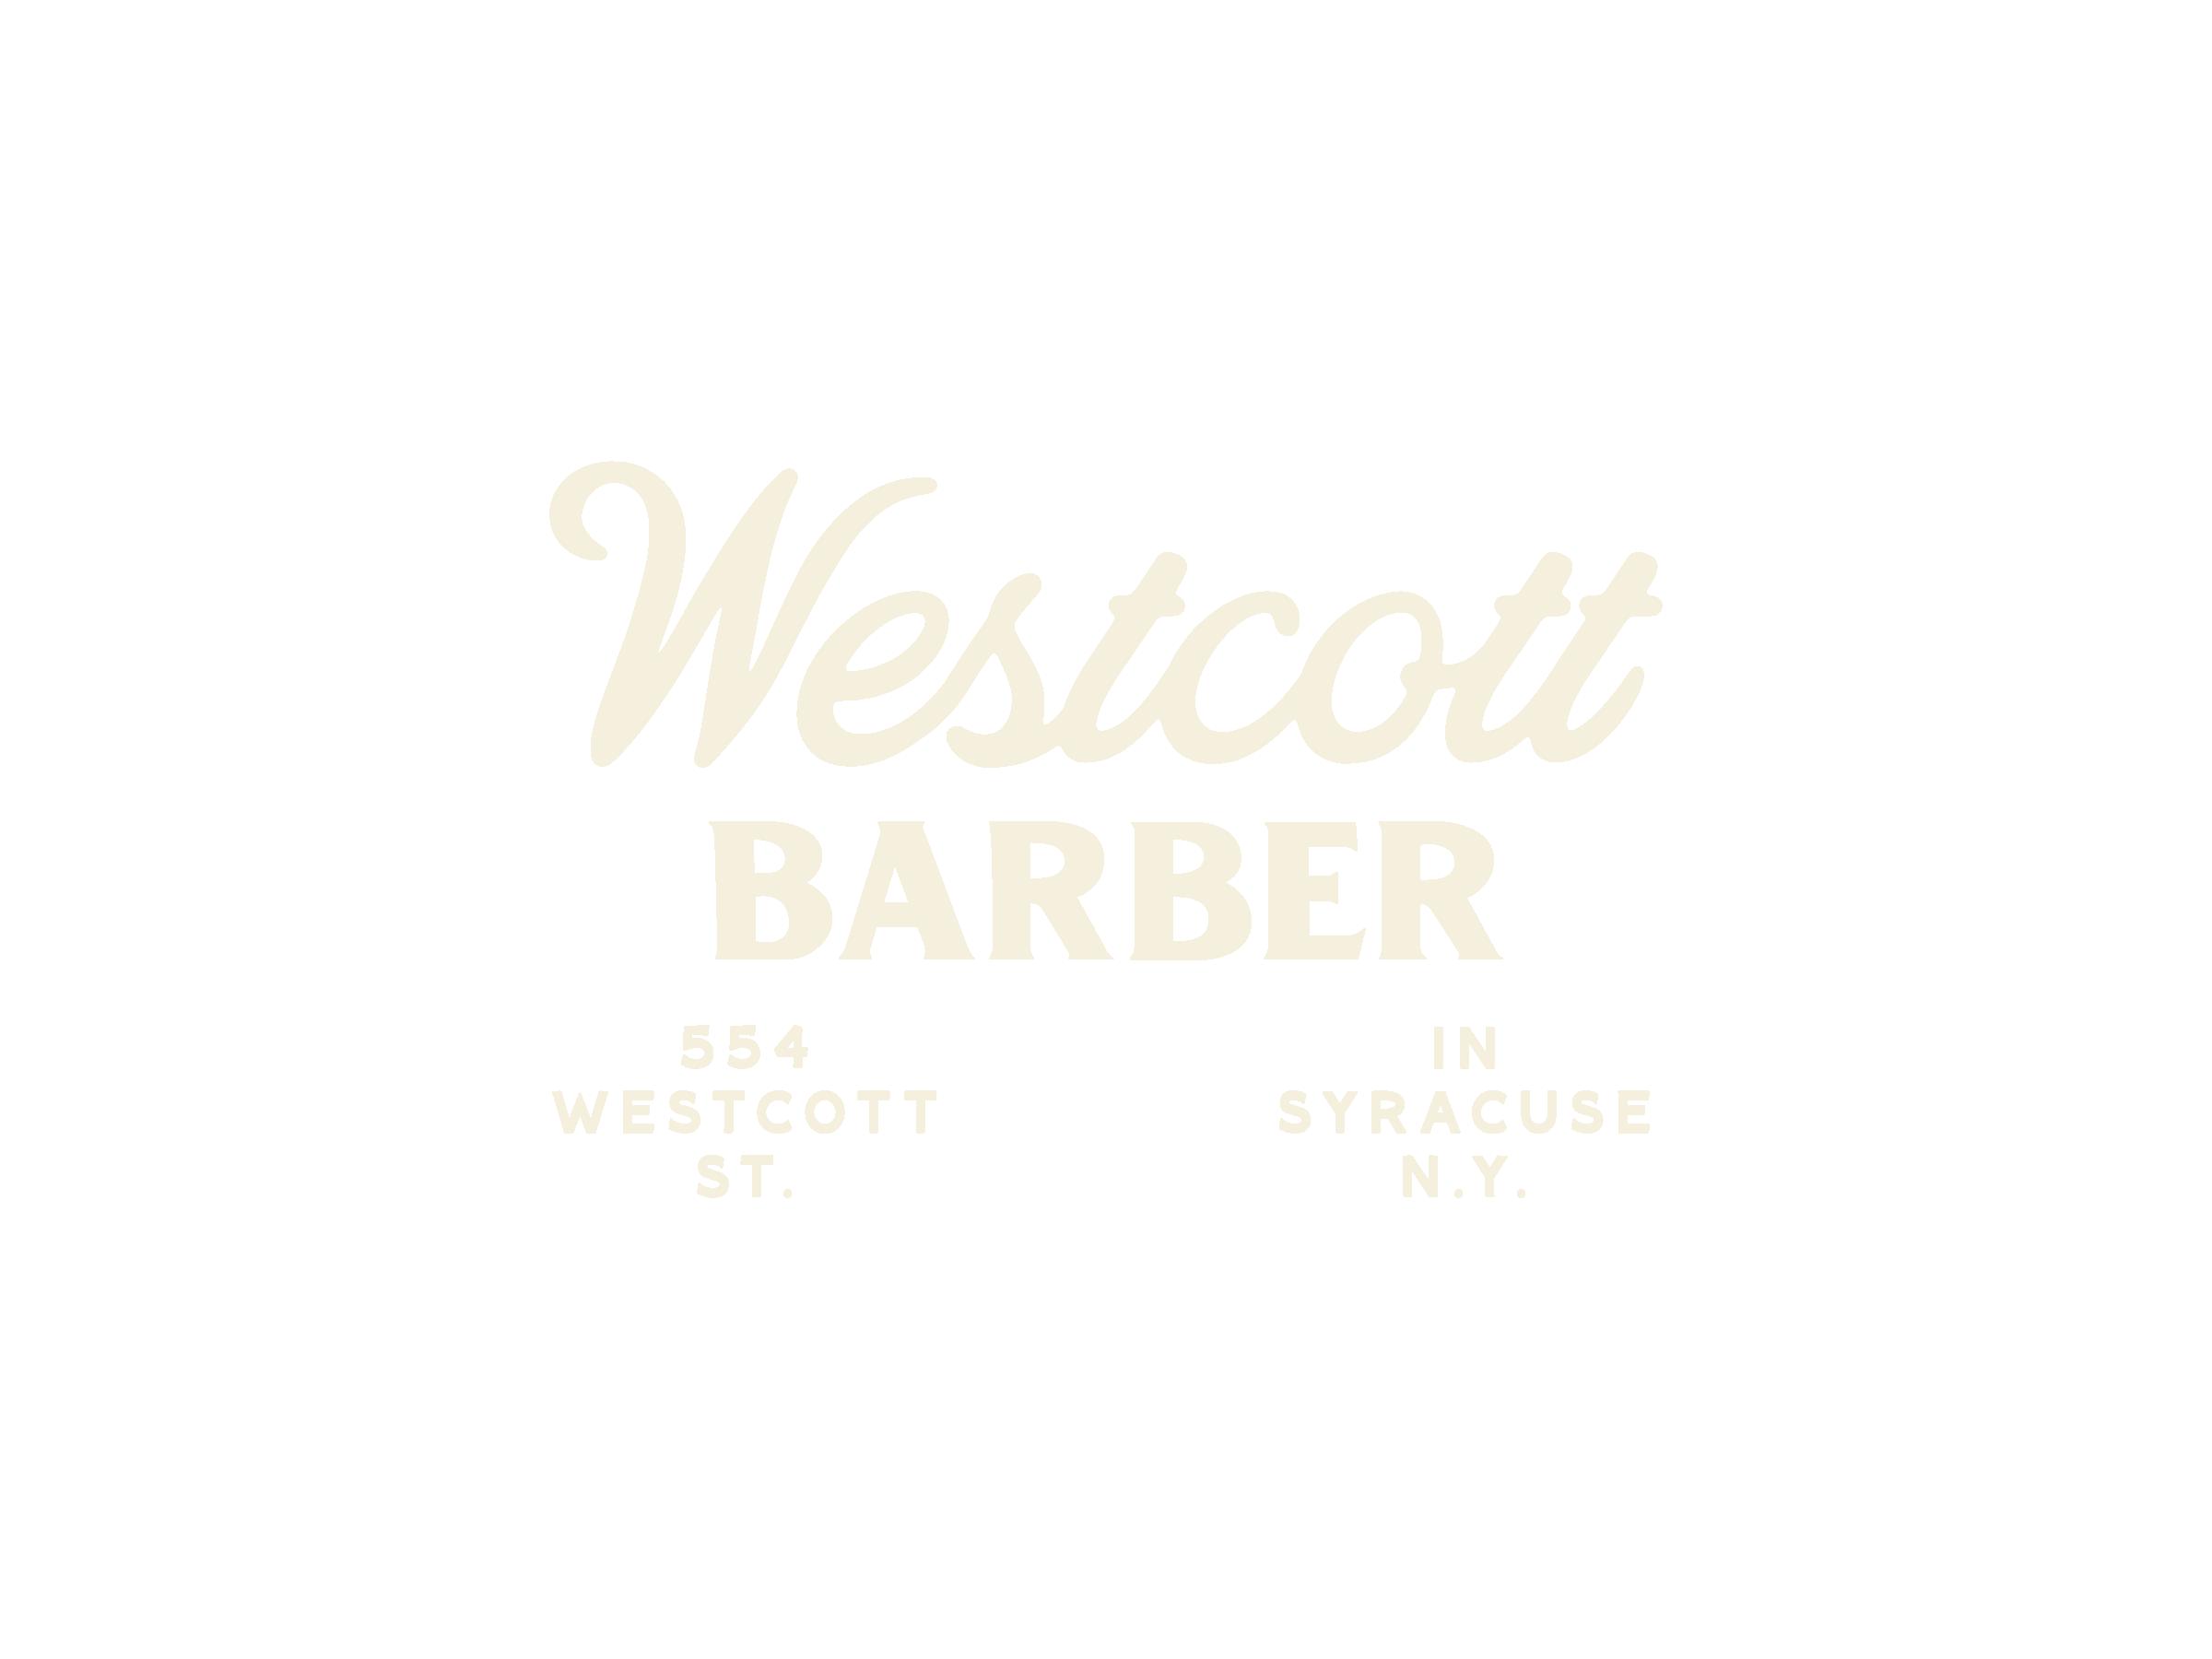 WESTCOTT BARBER